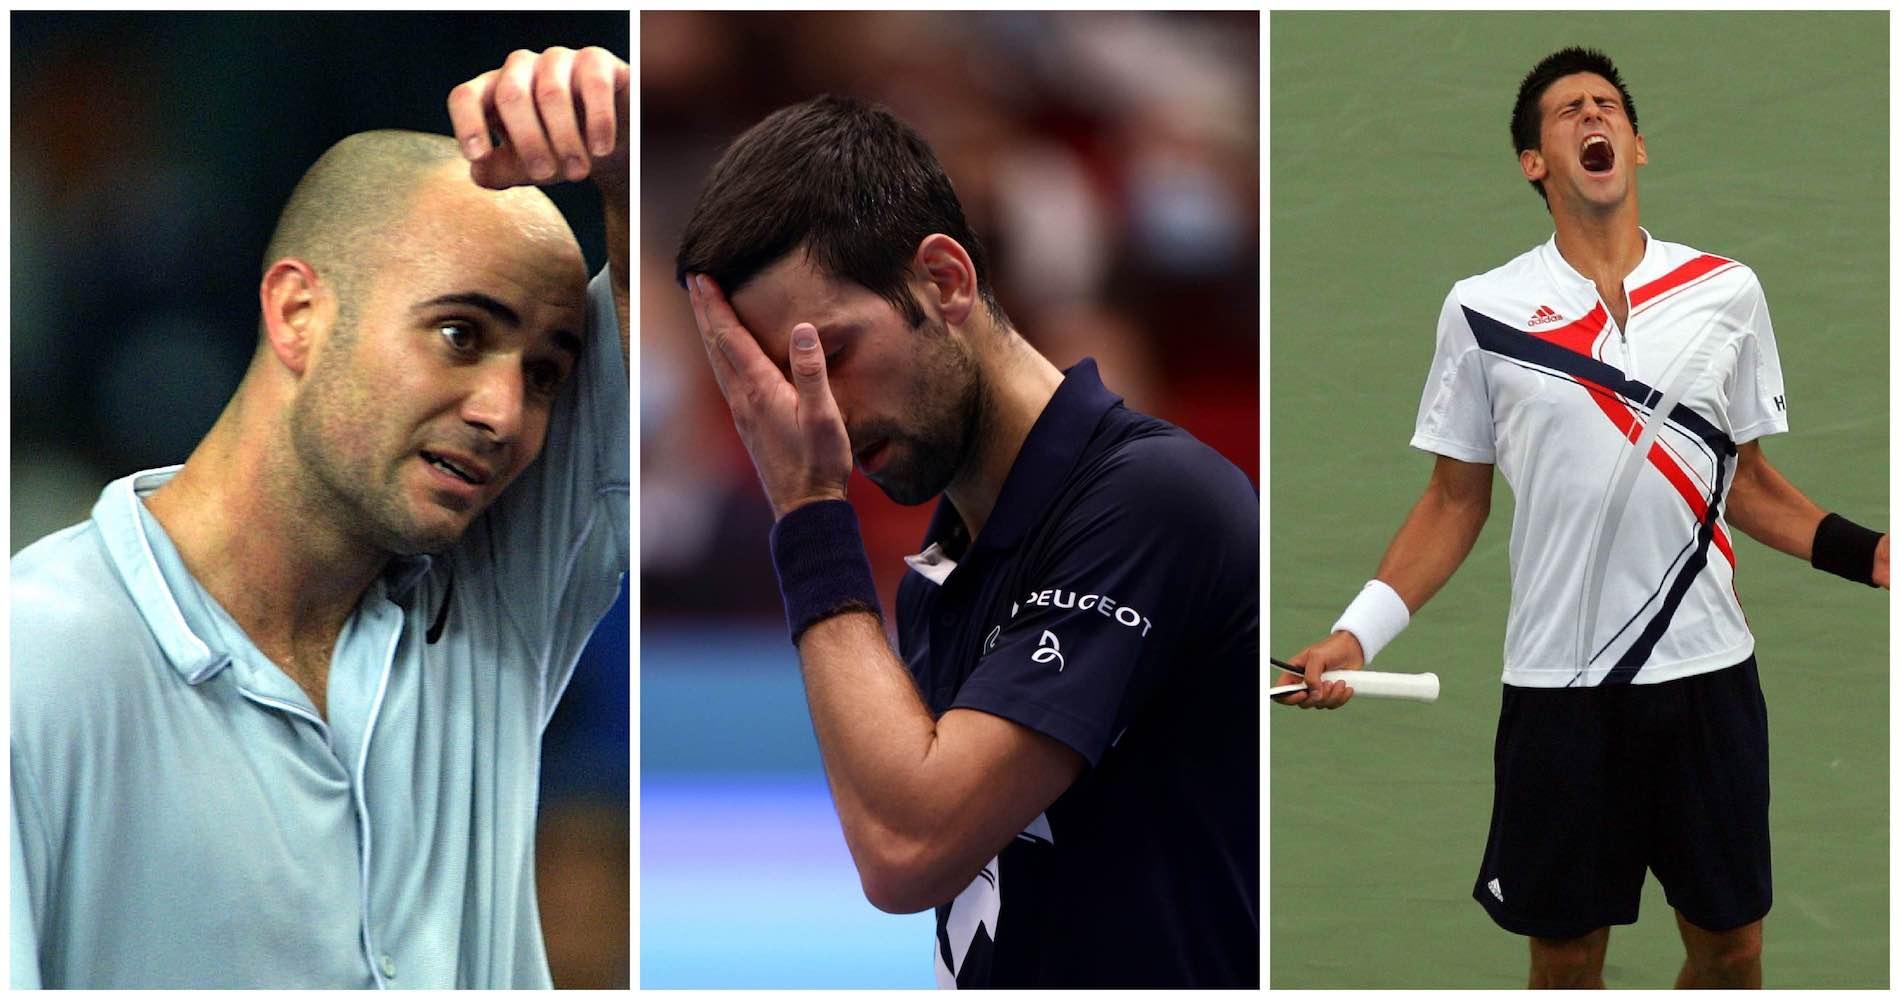 Andre Agassi (2000), Novak Djokovic (2020 et 2007)